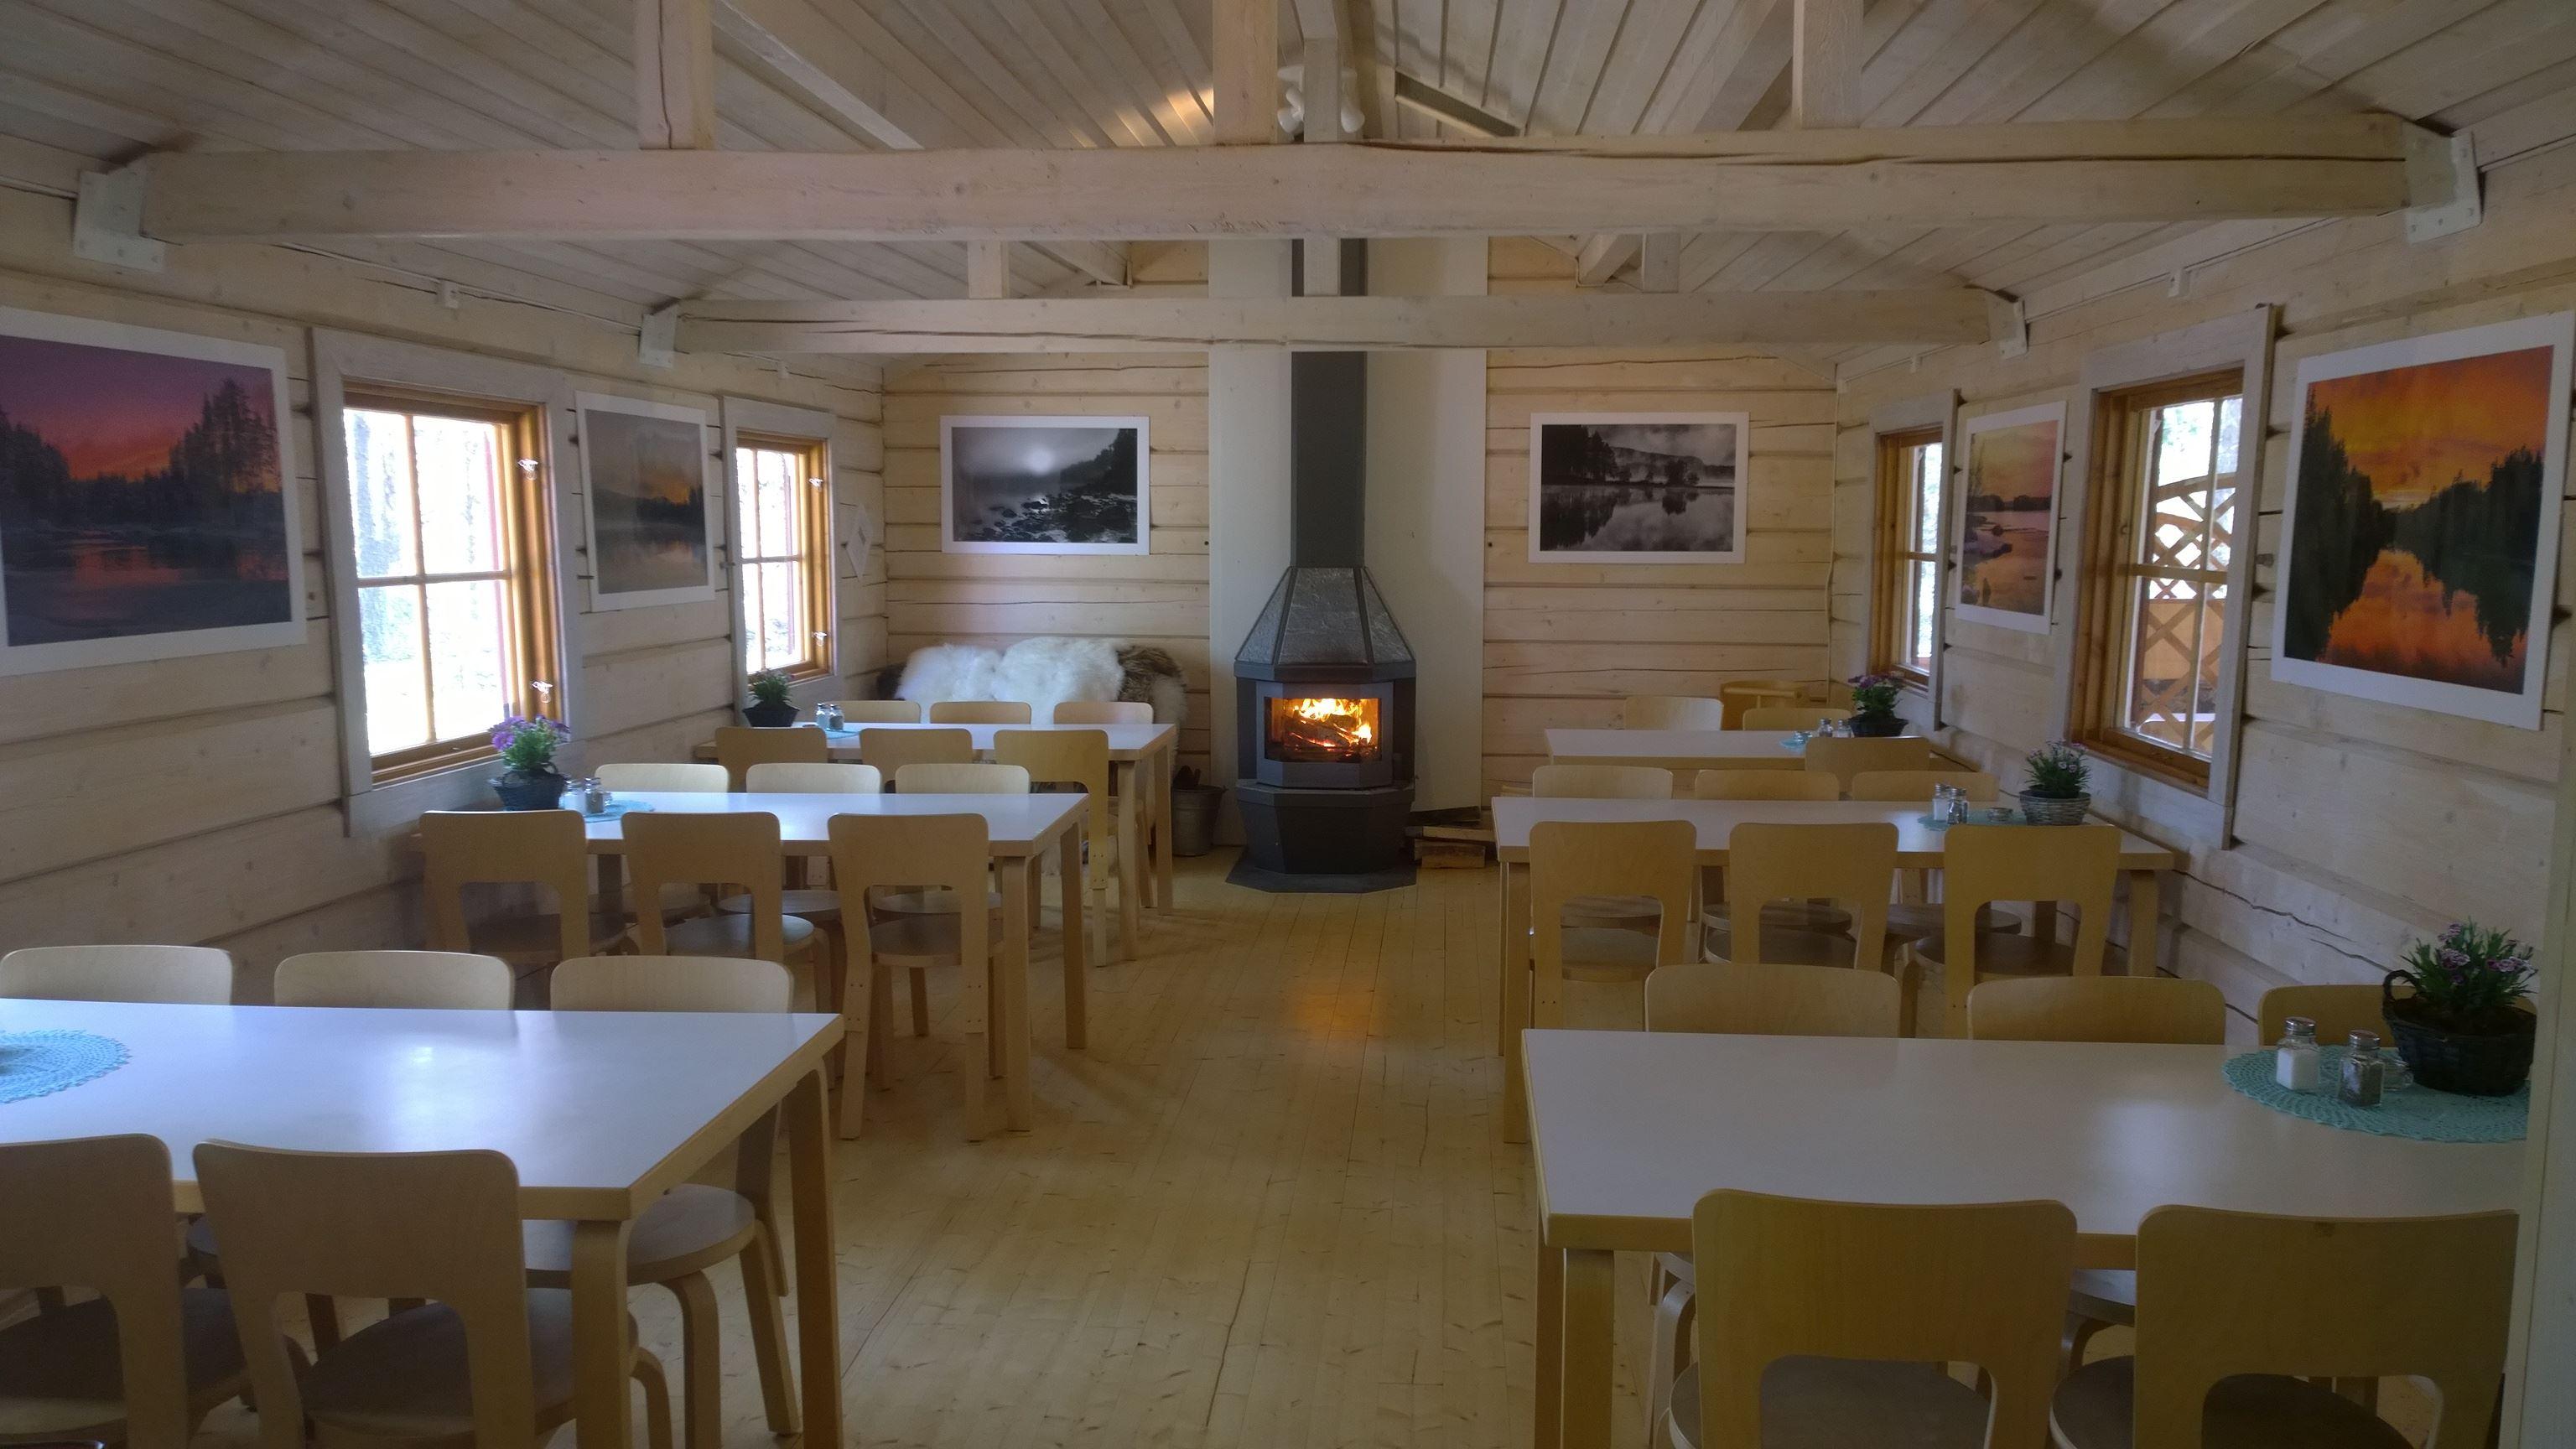 Mårdseleforsen Café & Restaurang